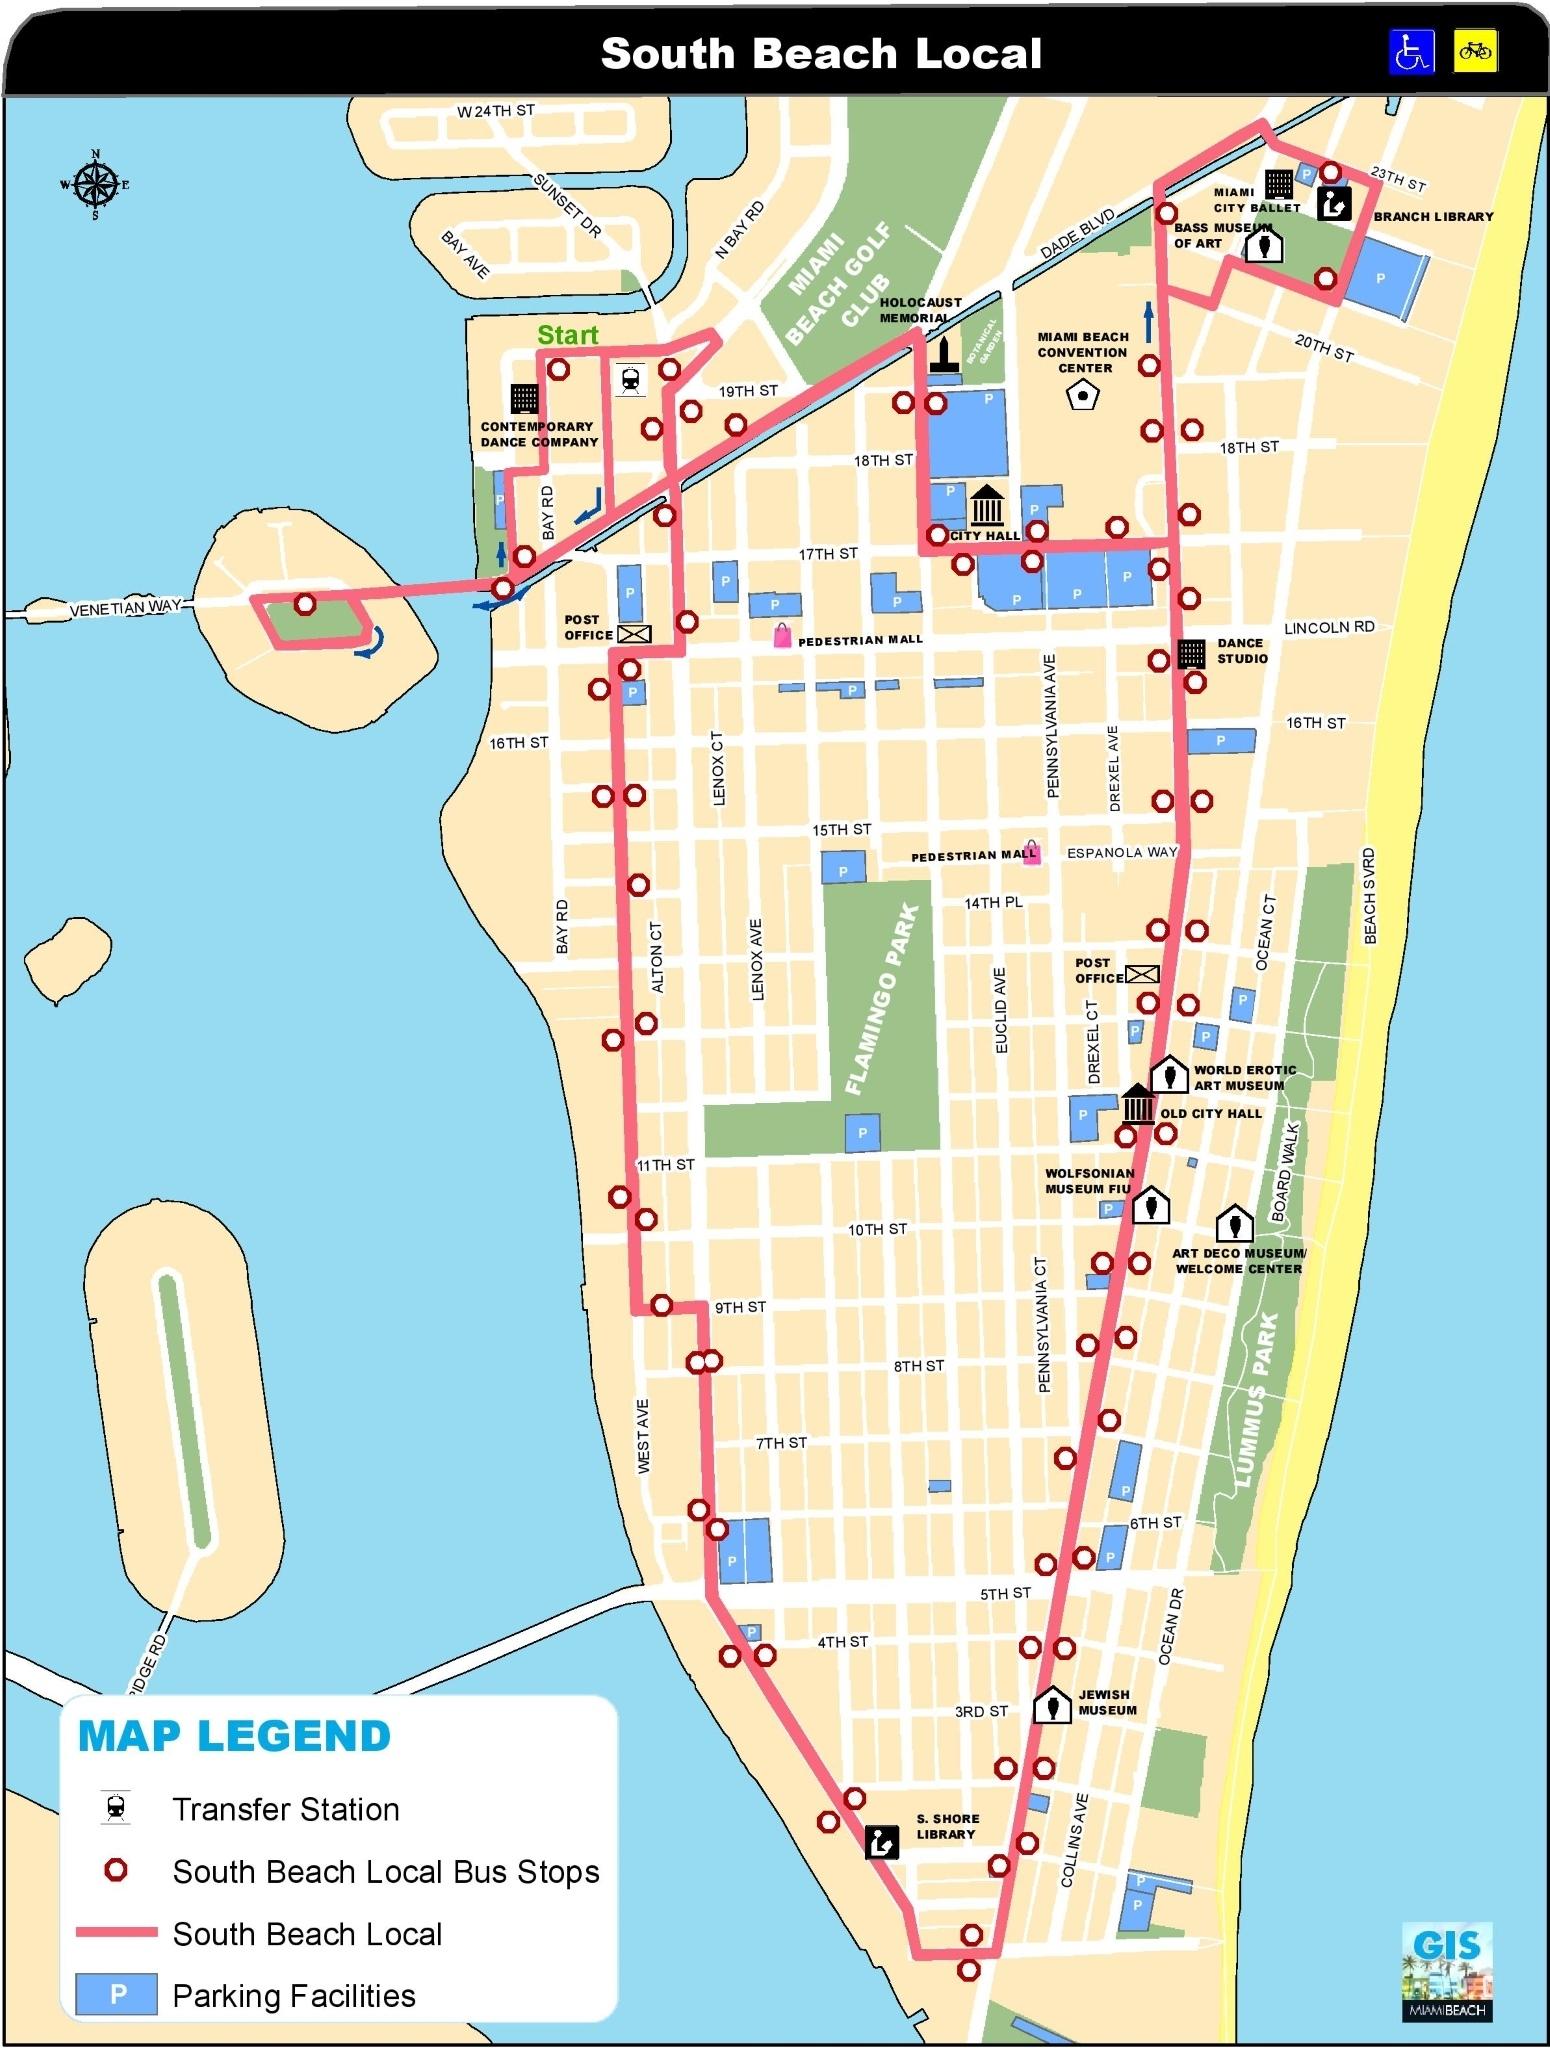 miami south beach map in map of miami beach area - ustrave